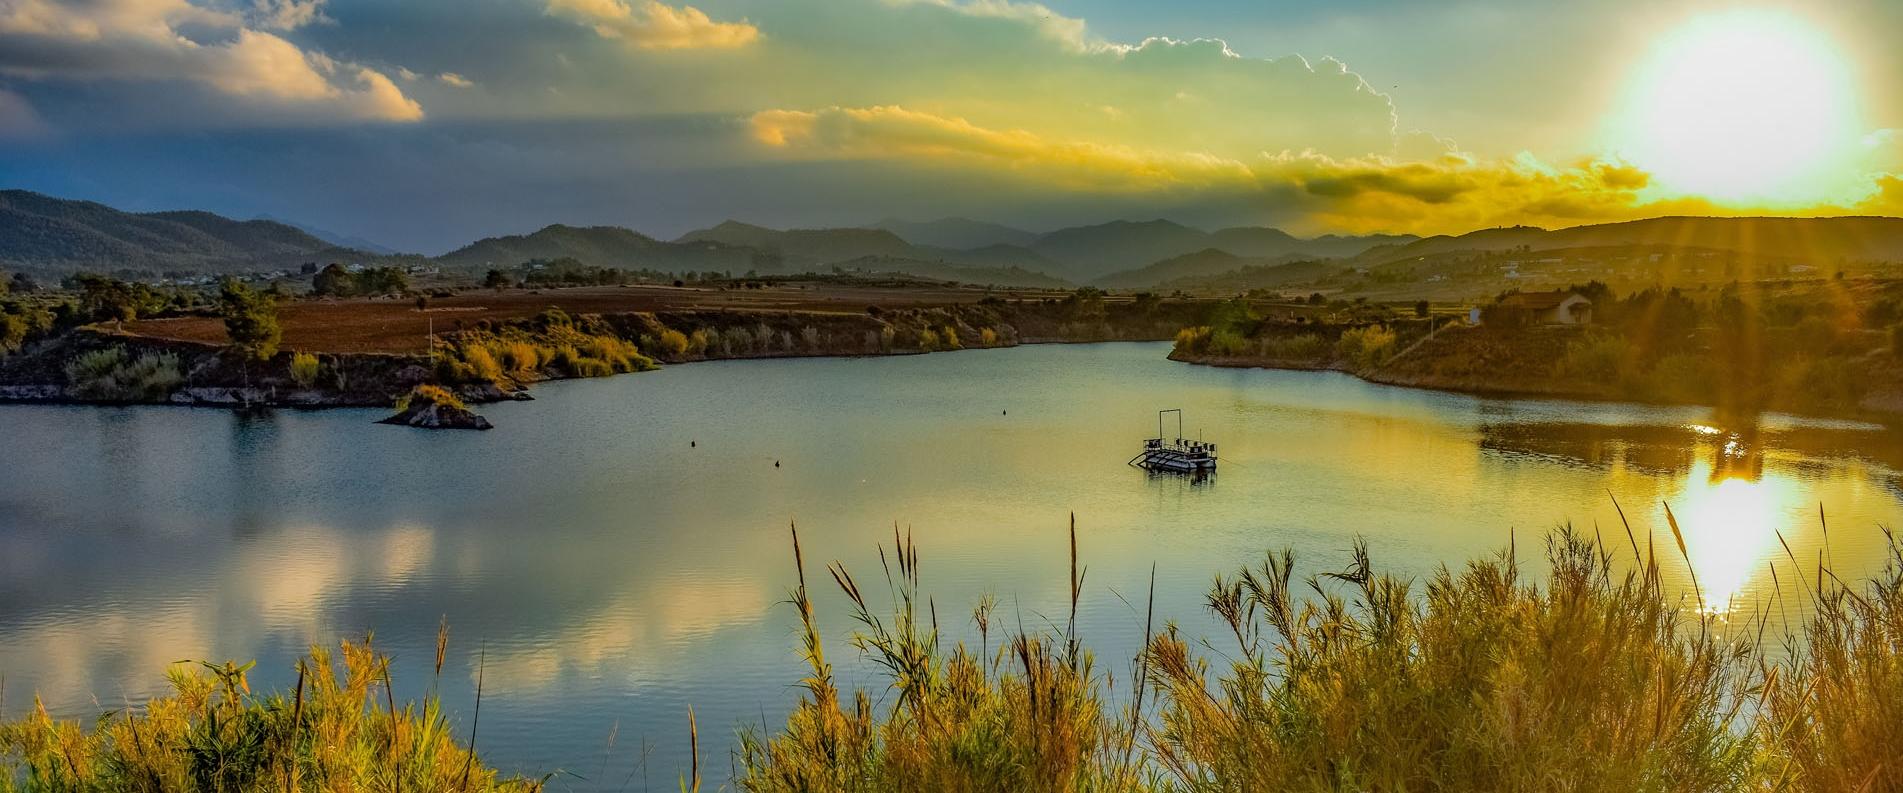 Внутренний туризм на Кипре